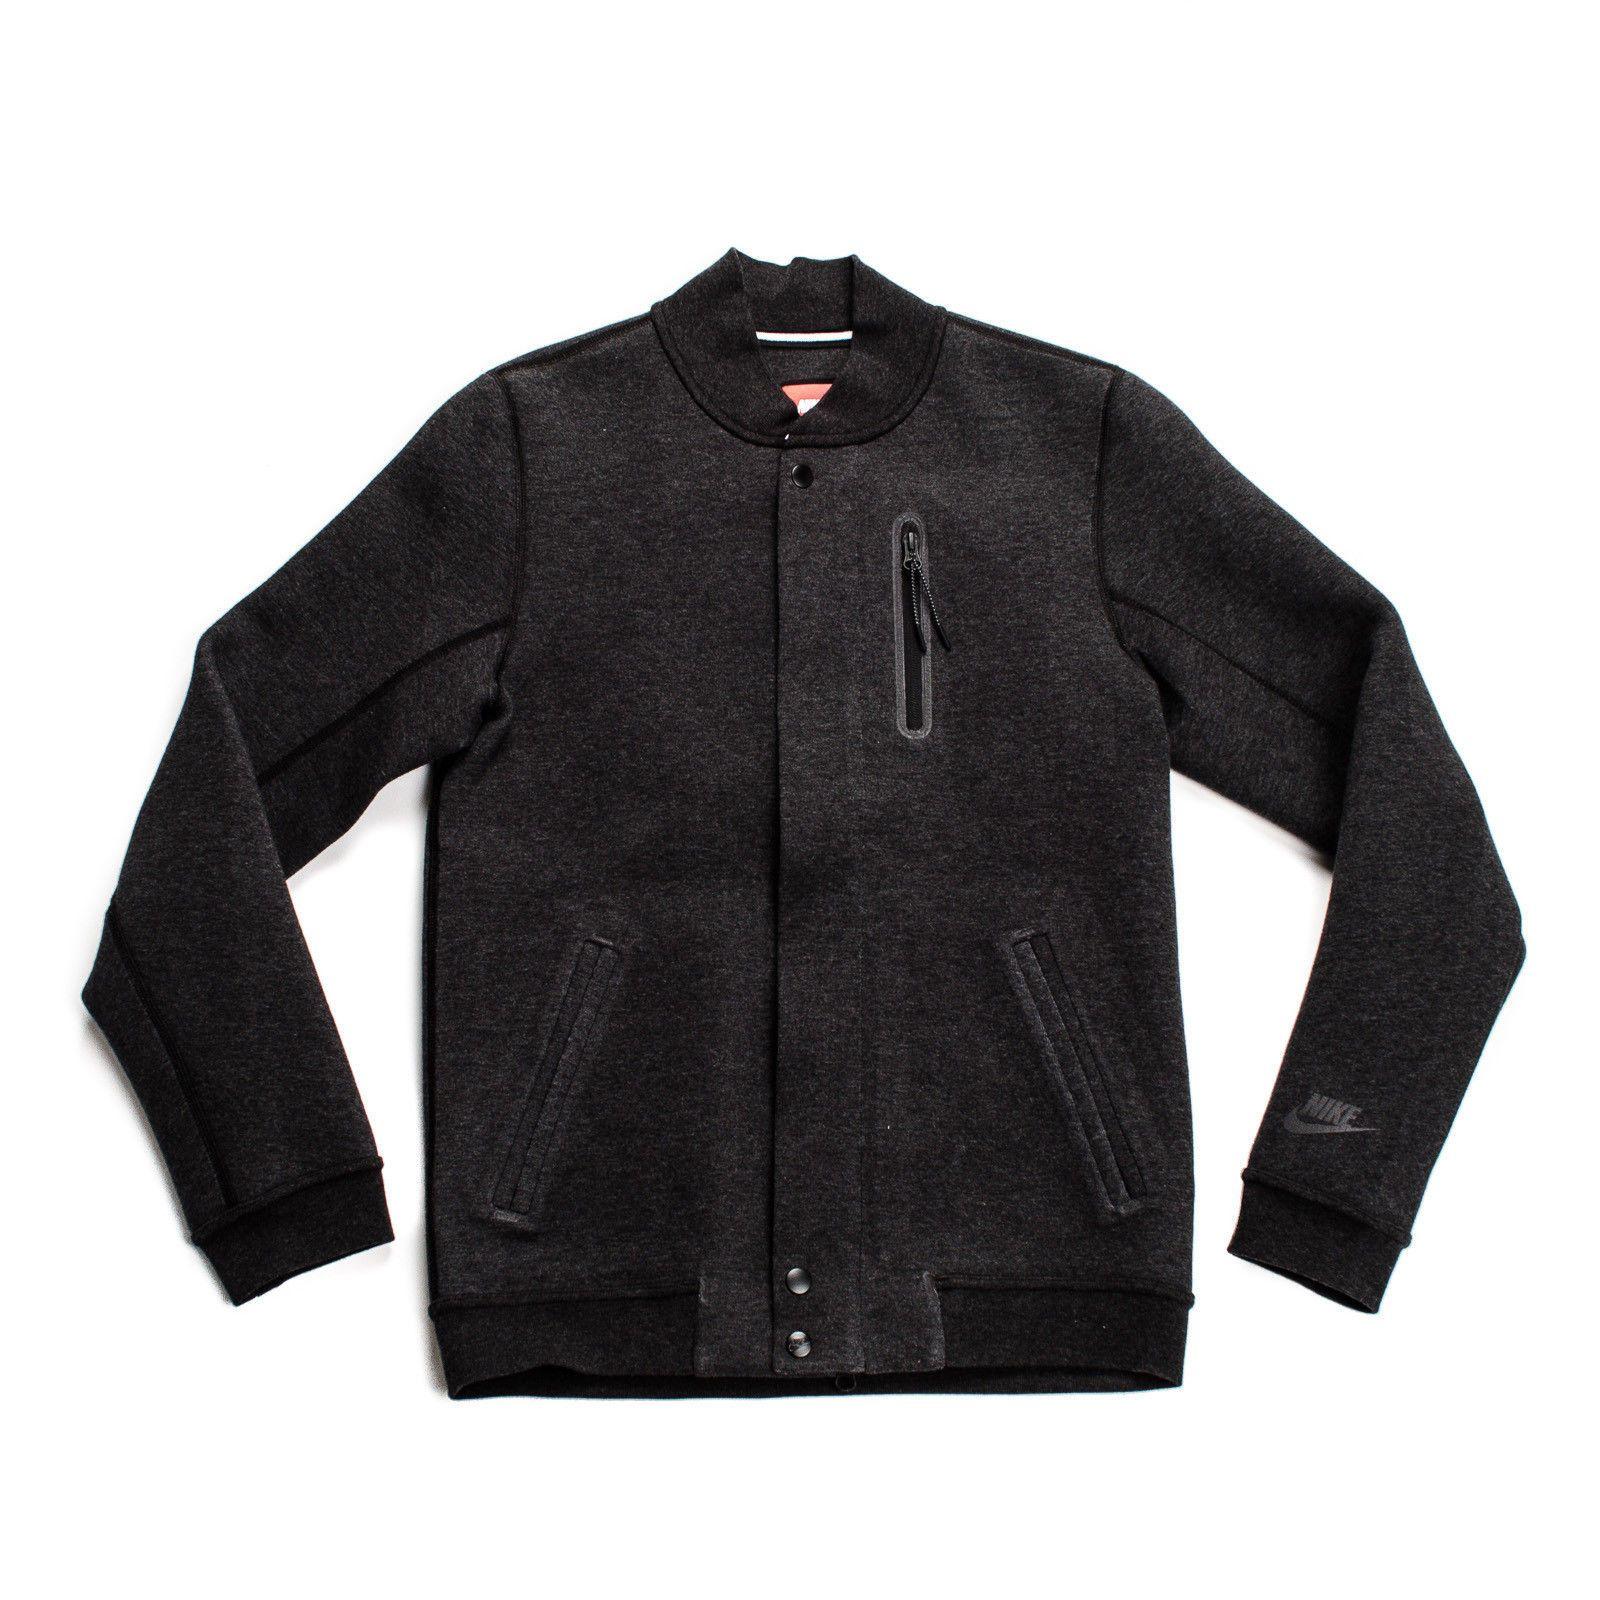 Nike Tech Fleece 3mm Varsity Jacket Black Grey Full Zip